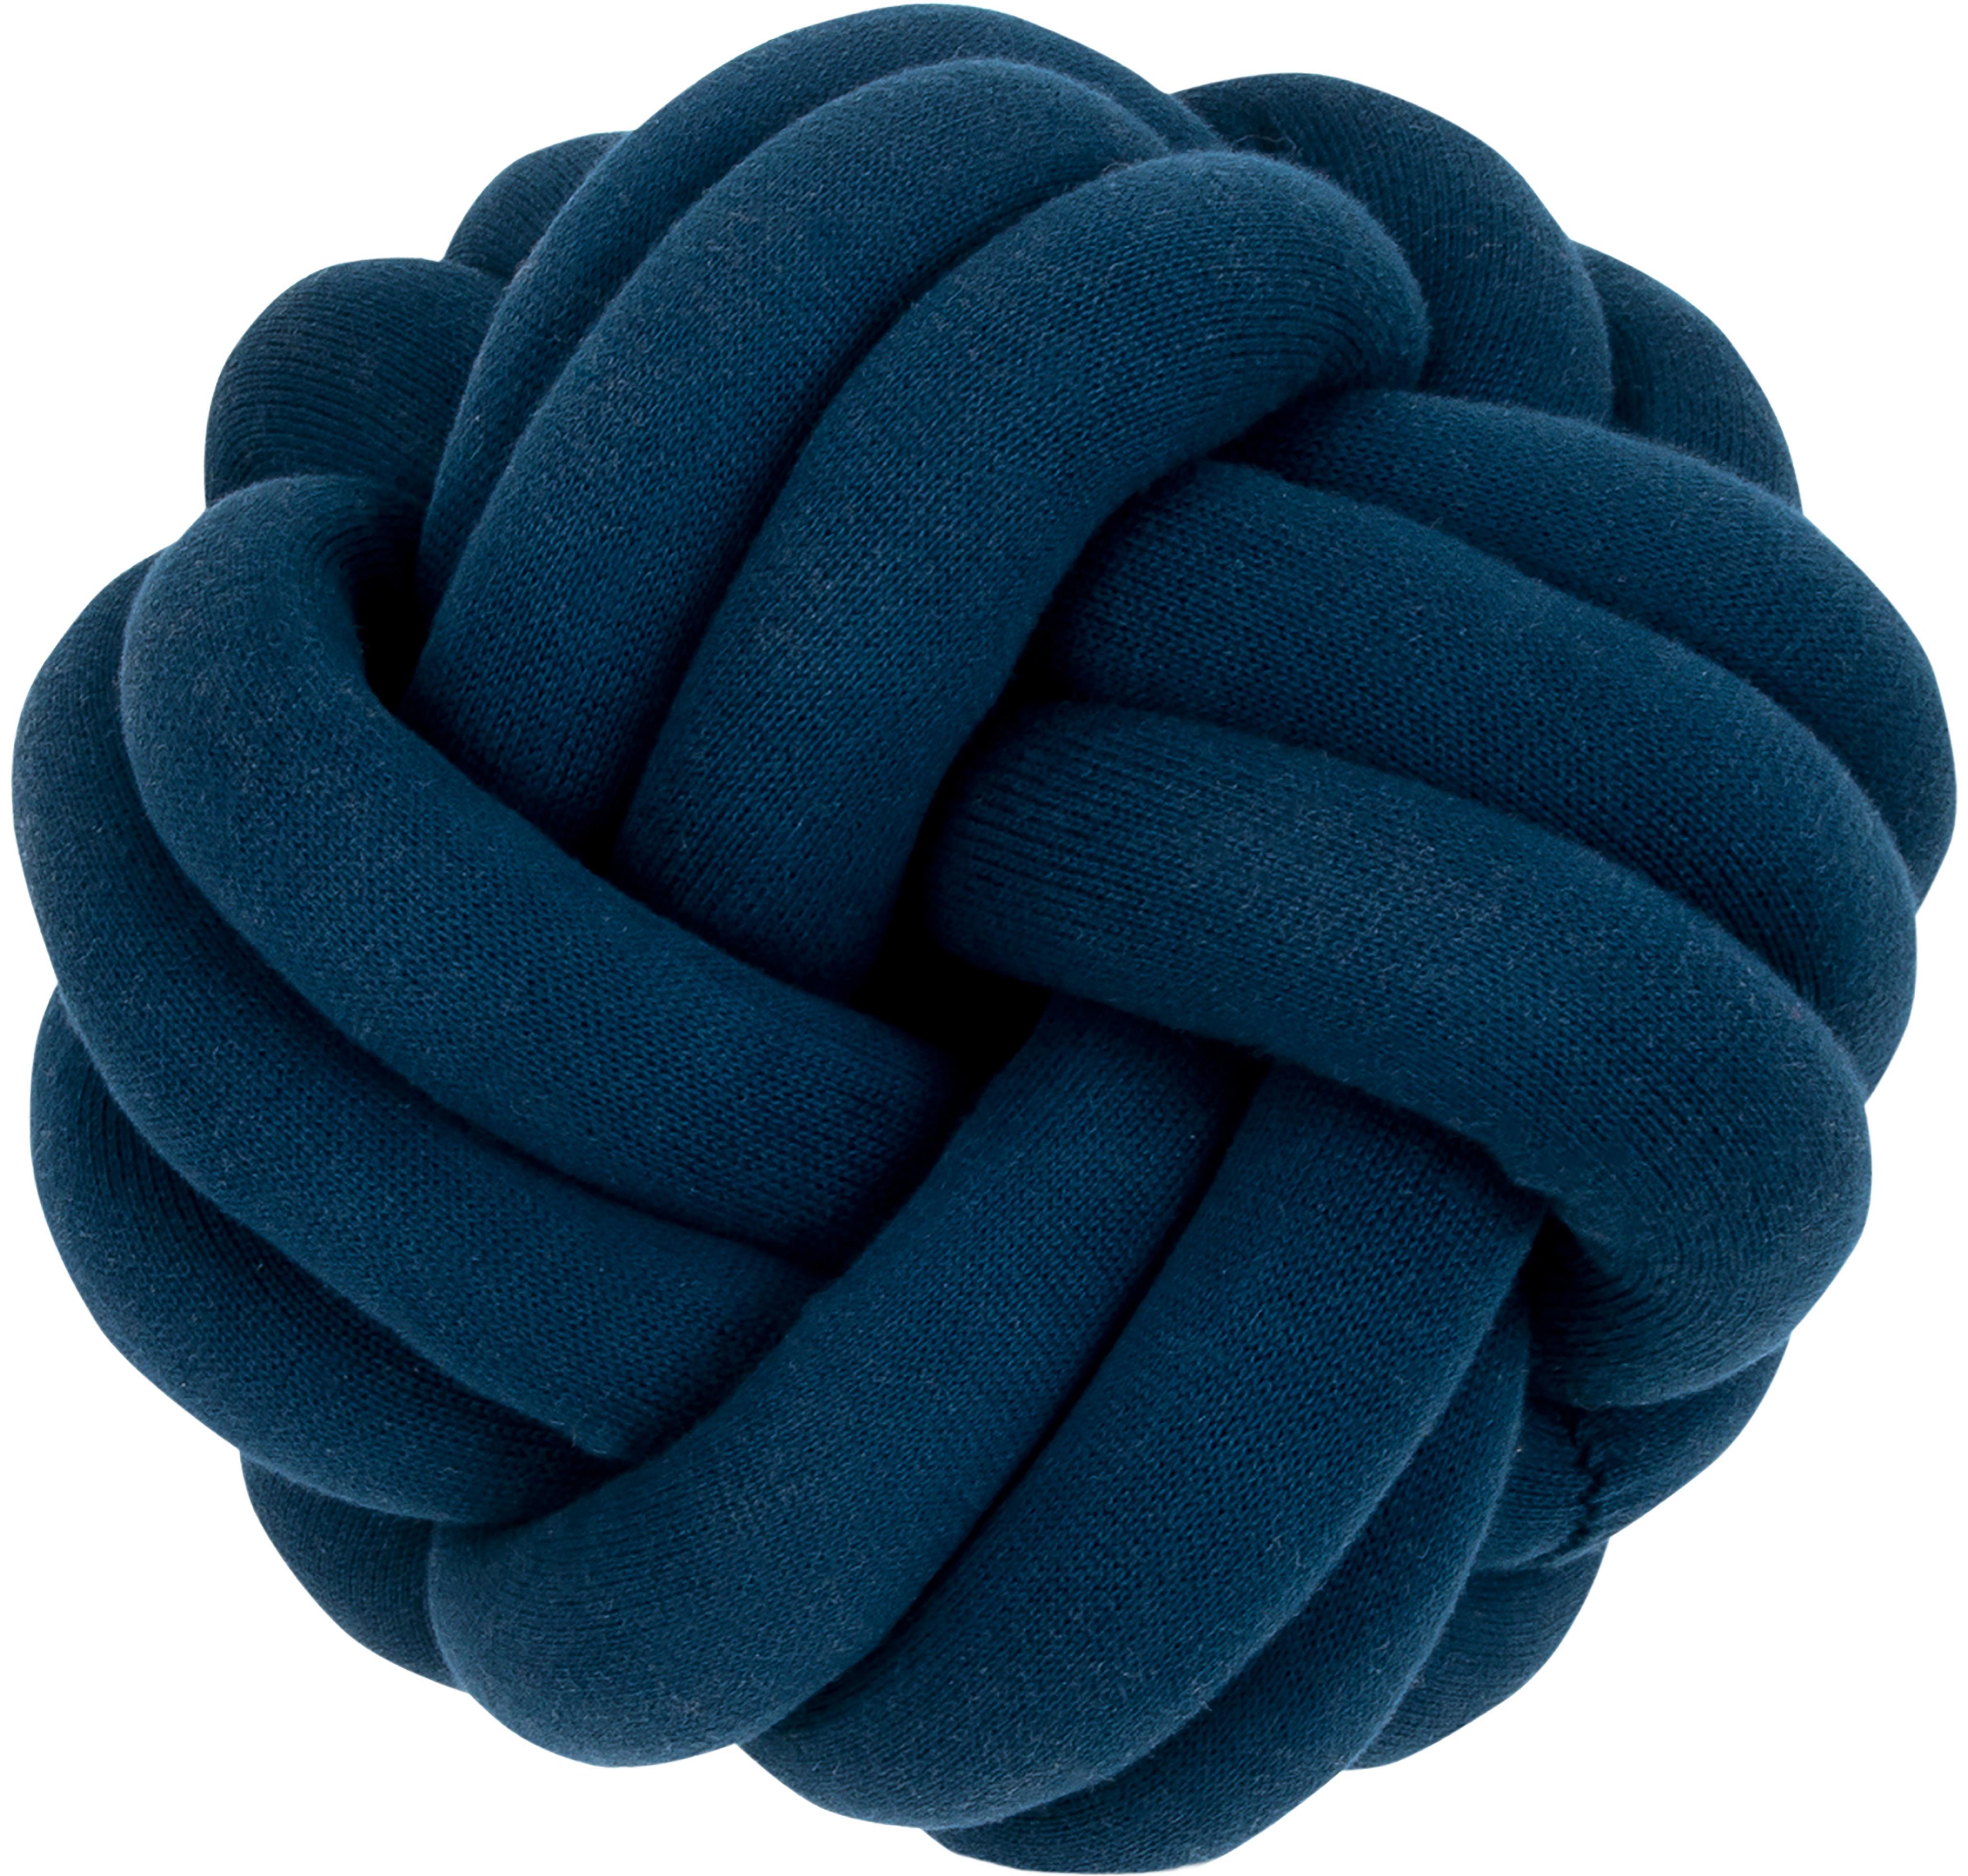 Cojín nudo Twist, Azul oscuro, Ø 30 cm